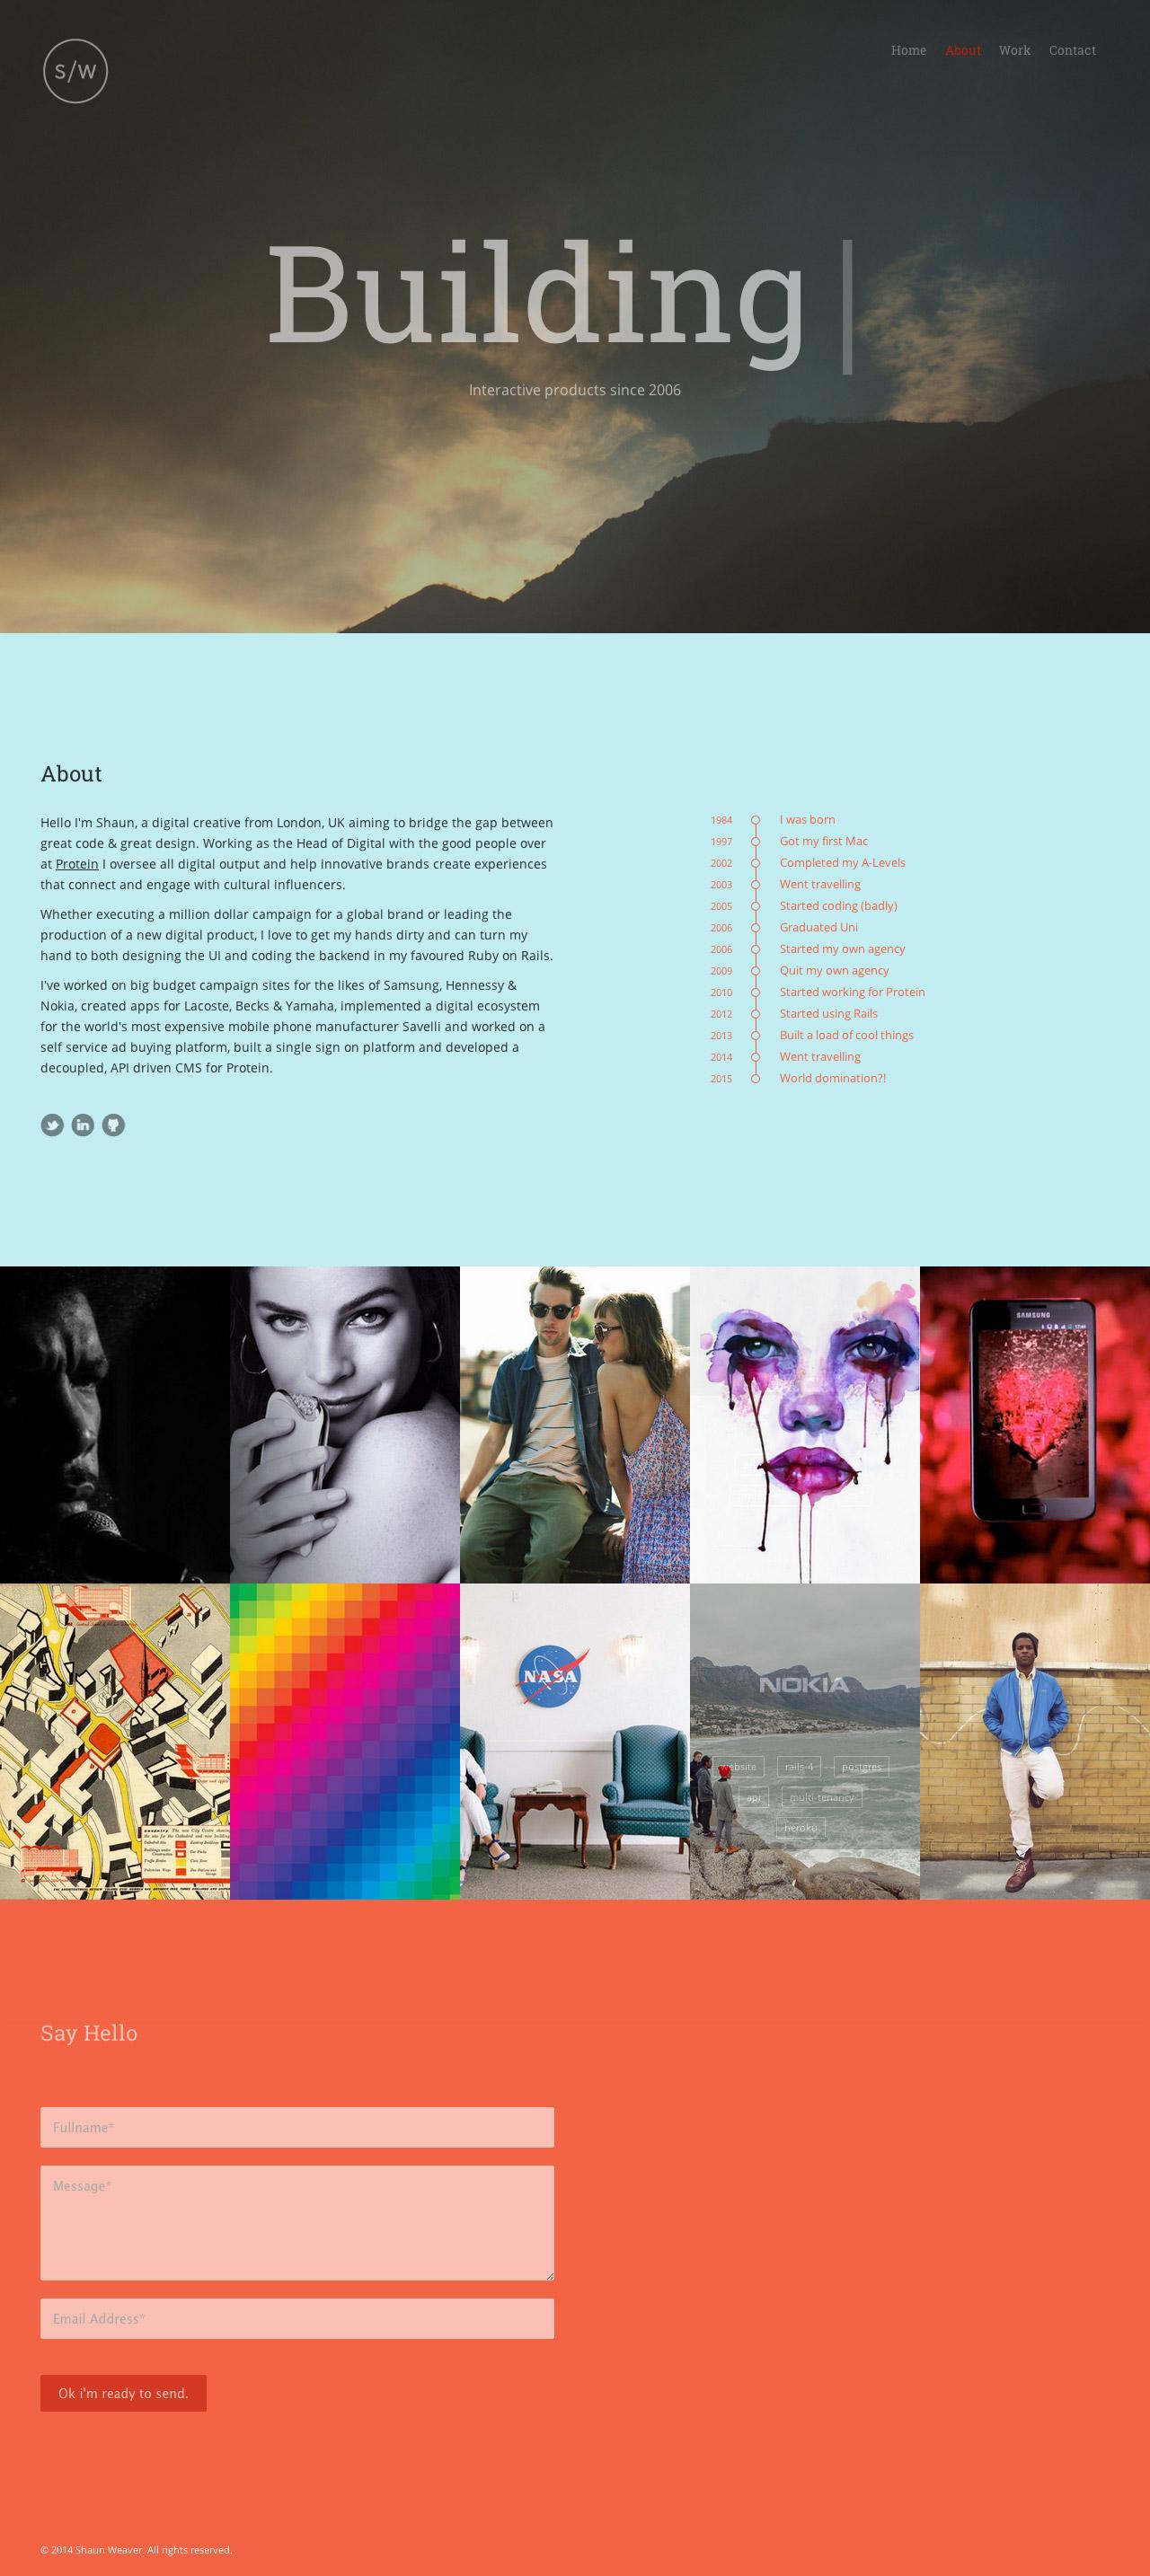 Shaun Weaver Website Screenshot